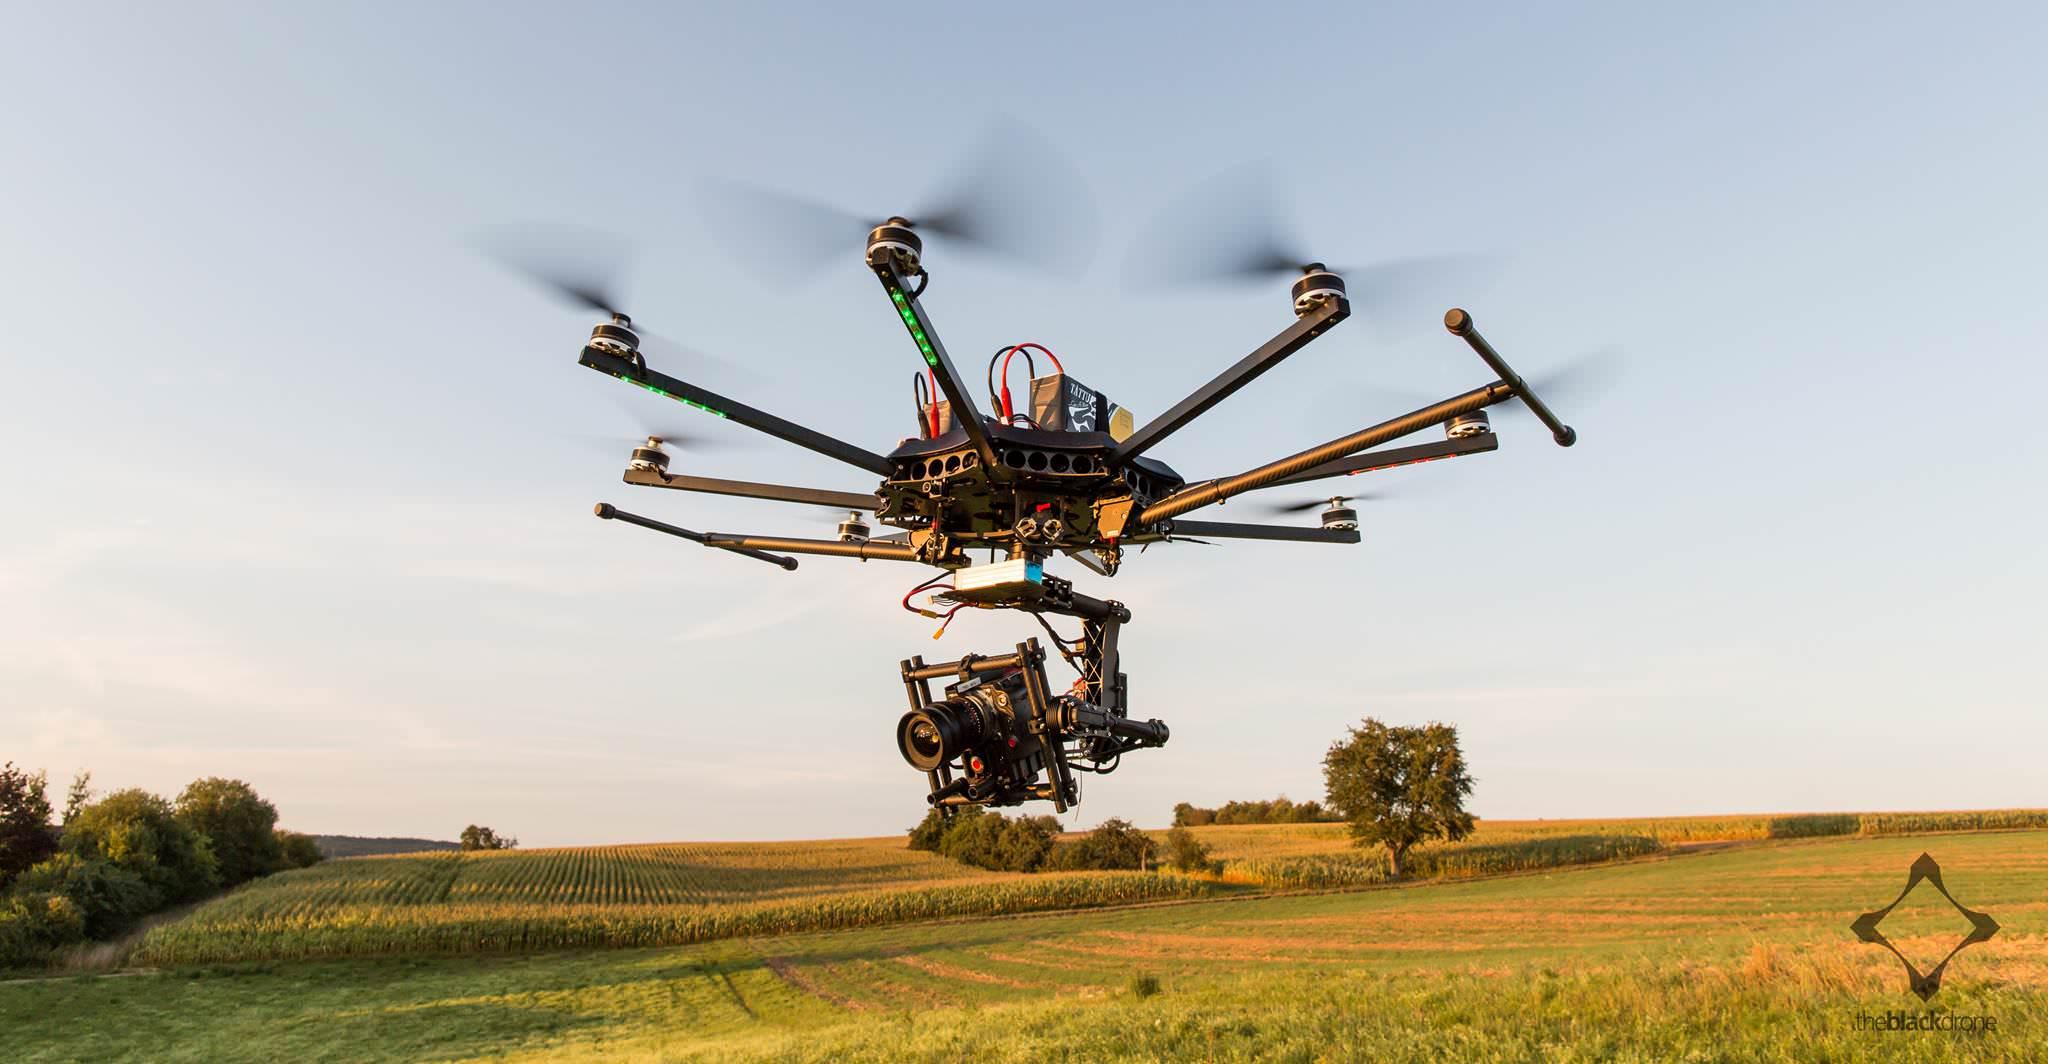 theblackdrone RAW copter